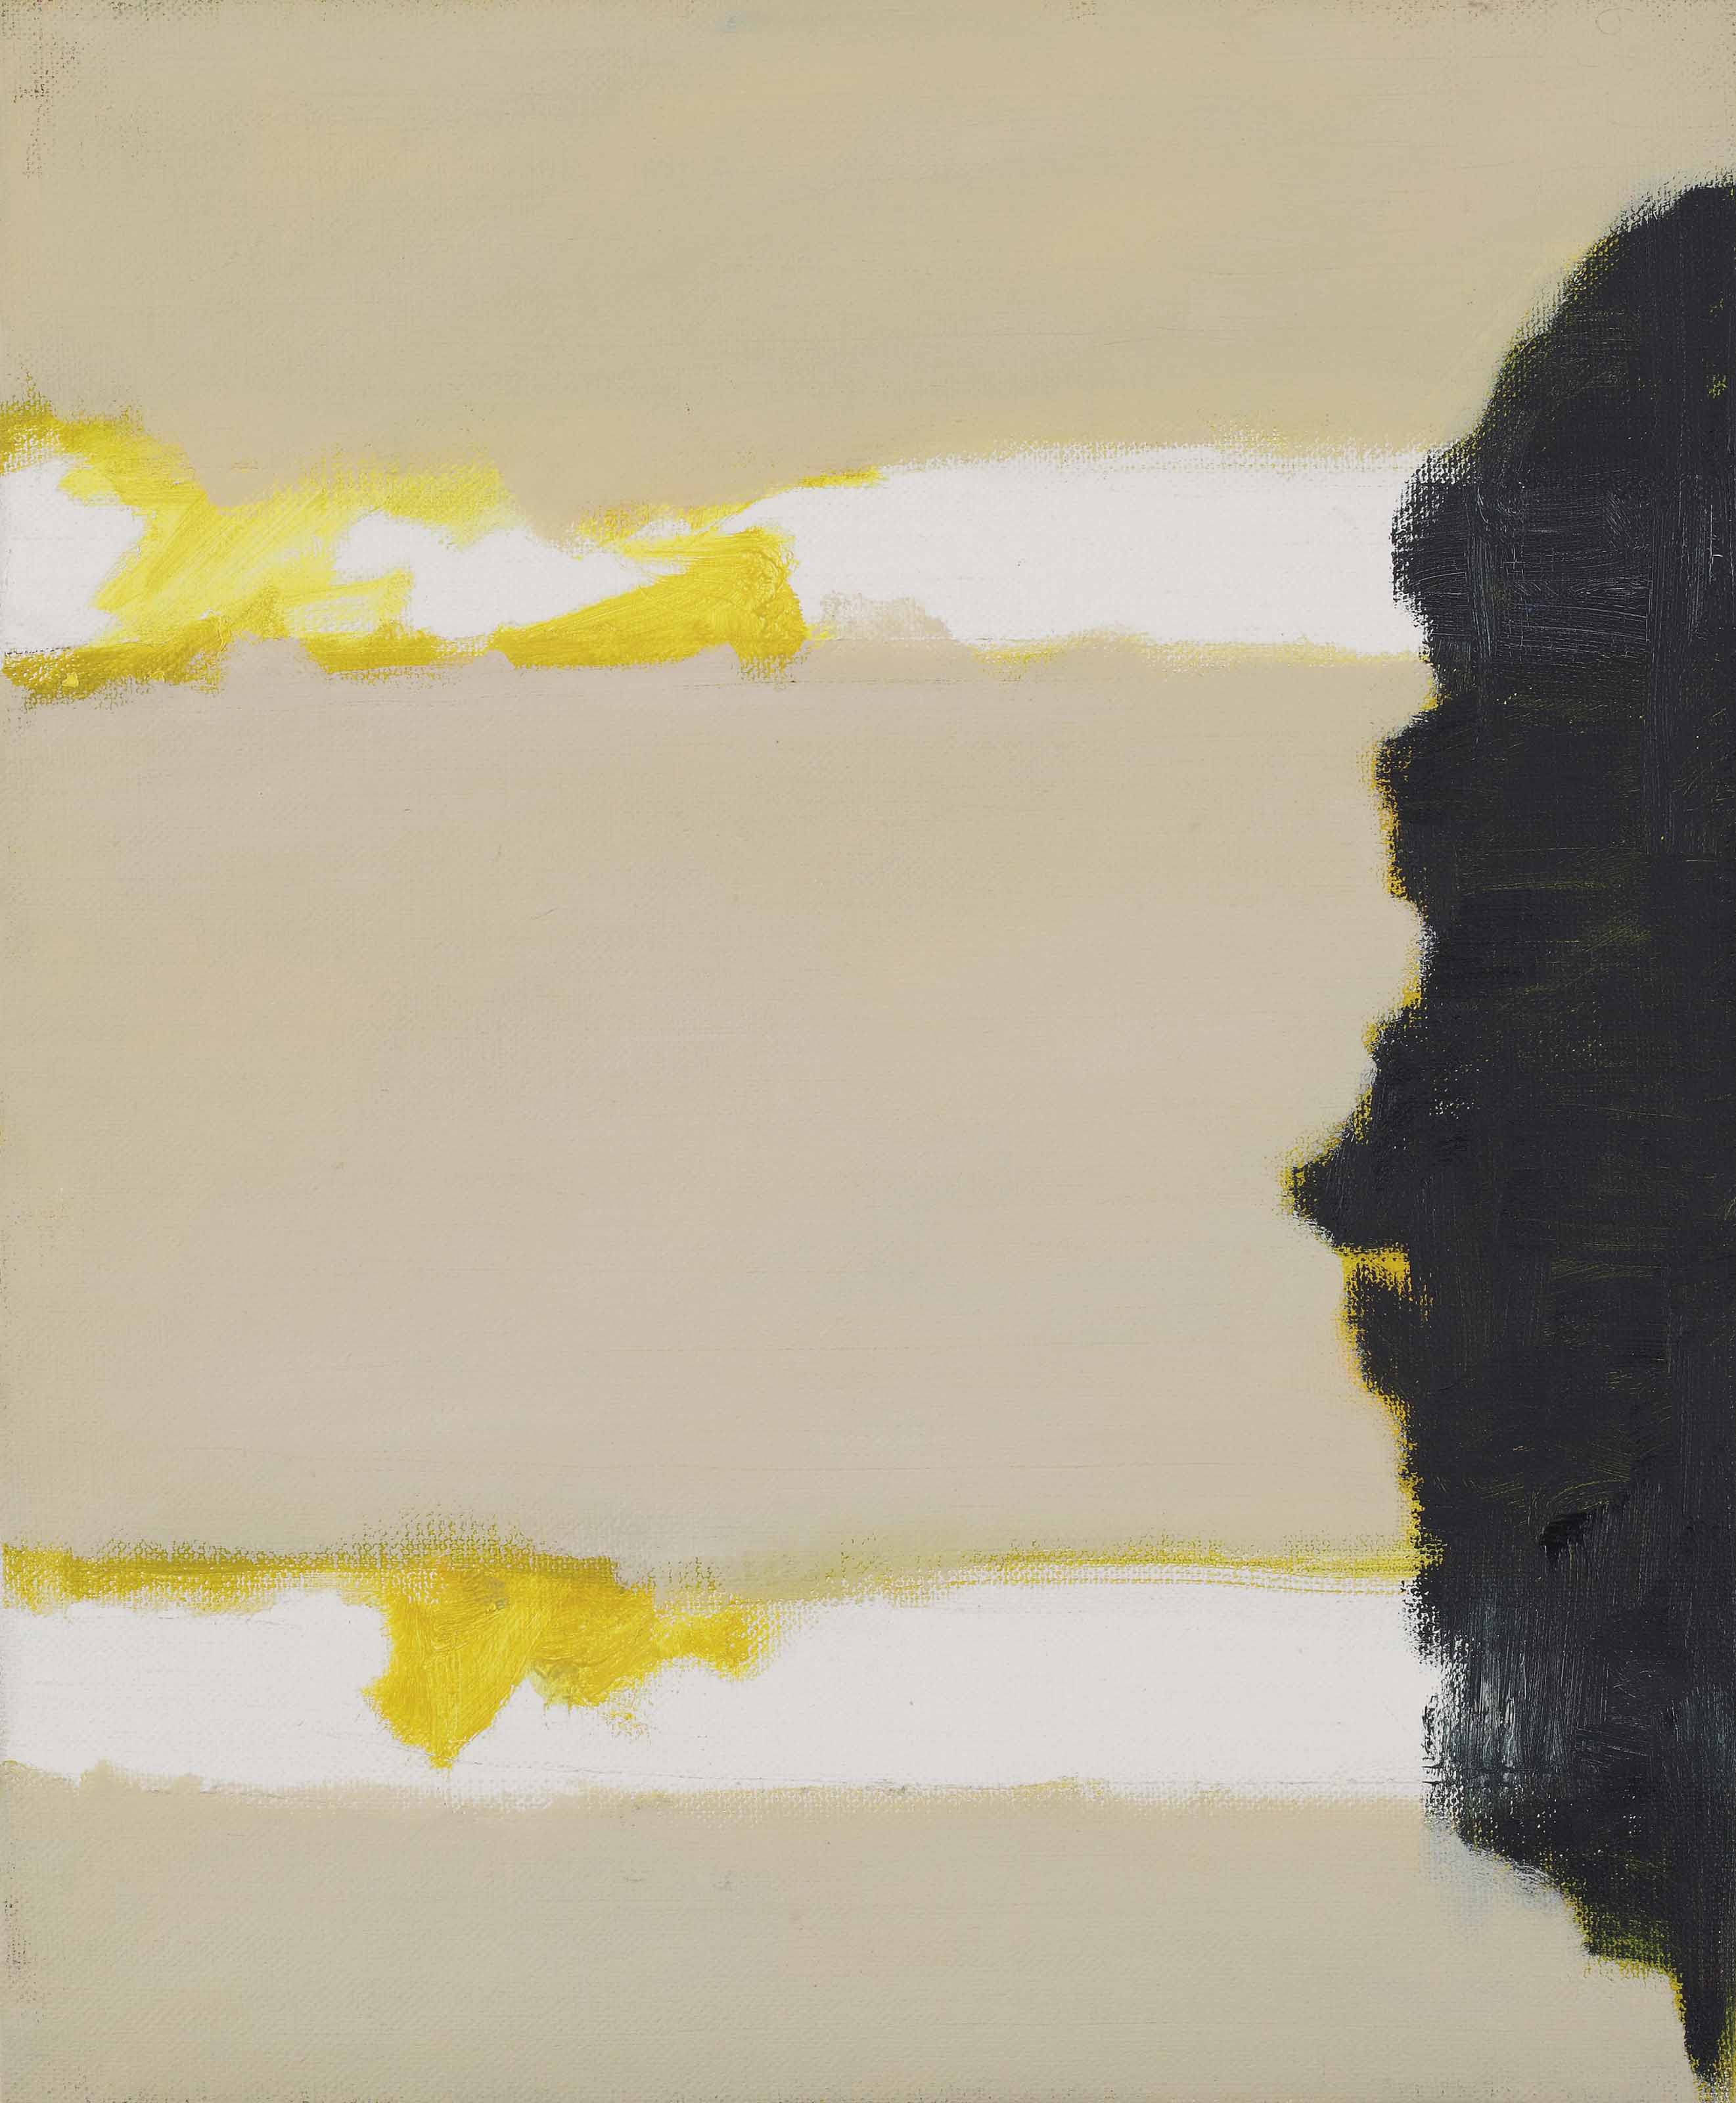 Raoul De Keyser (1930-2012)